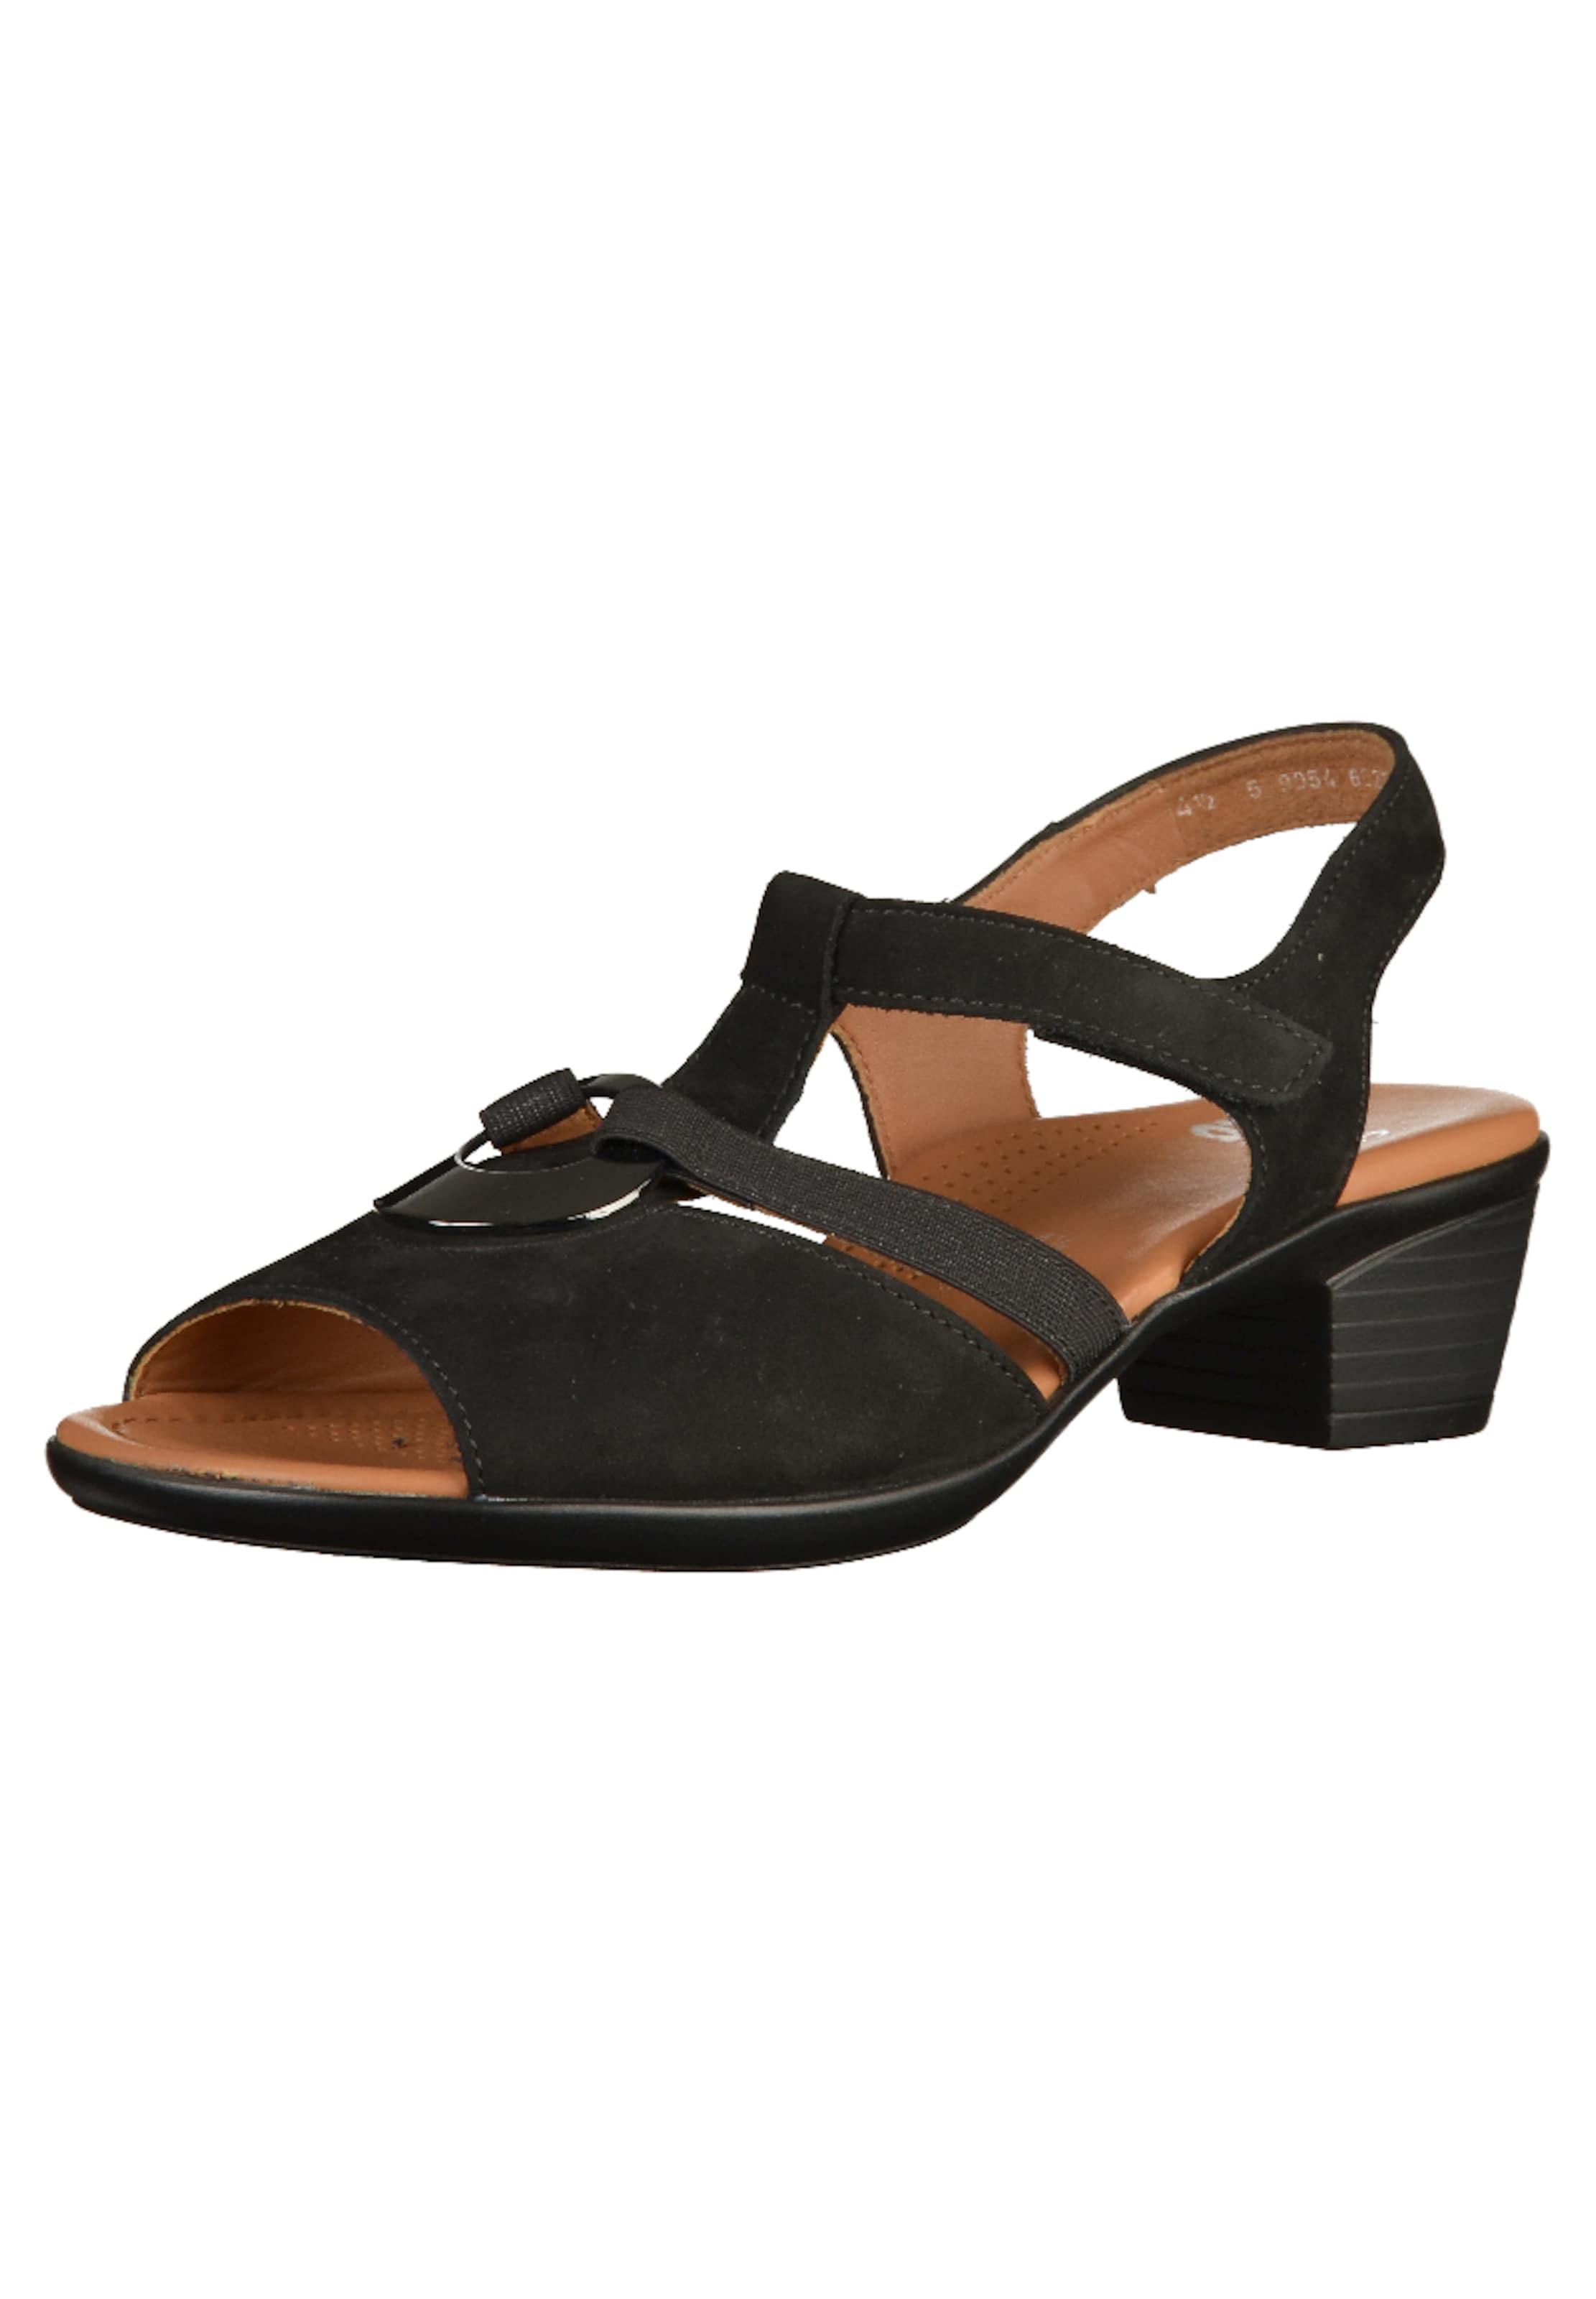 Haltbare Mode billige Schuhe ARA | Sandalen Schuhe Gut getragene Schuhe